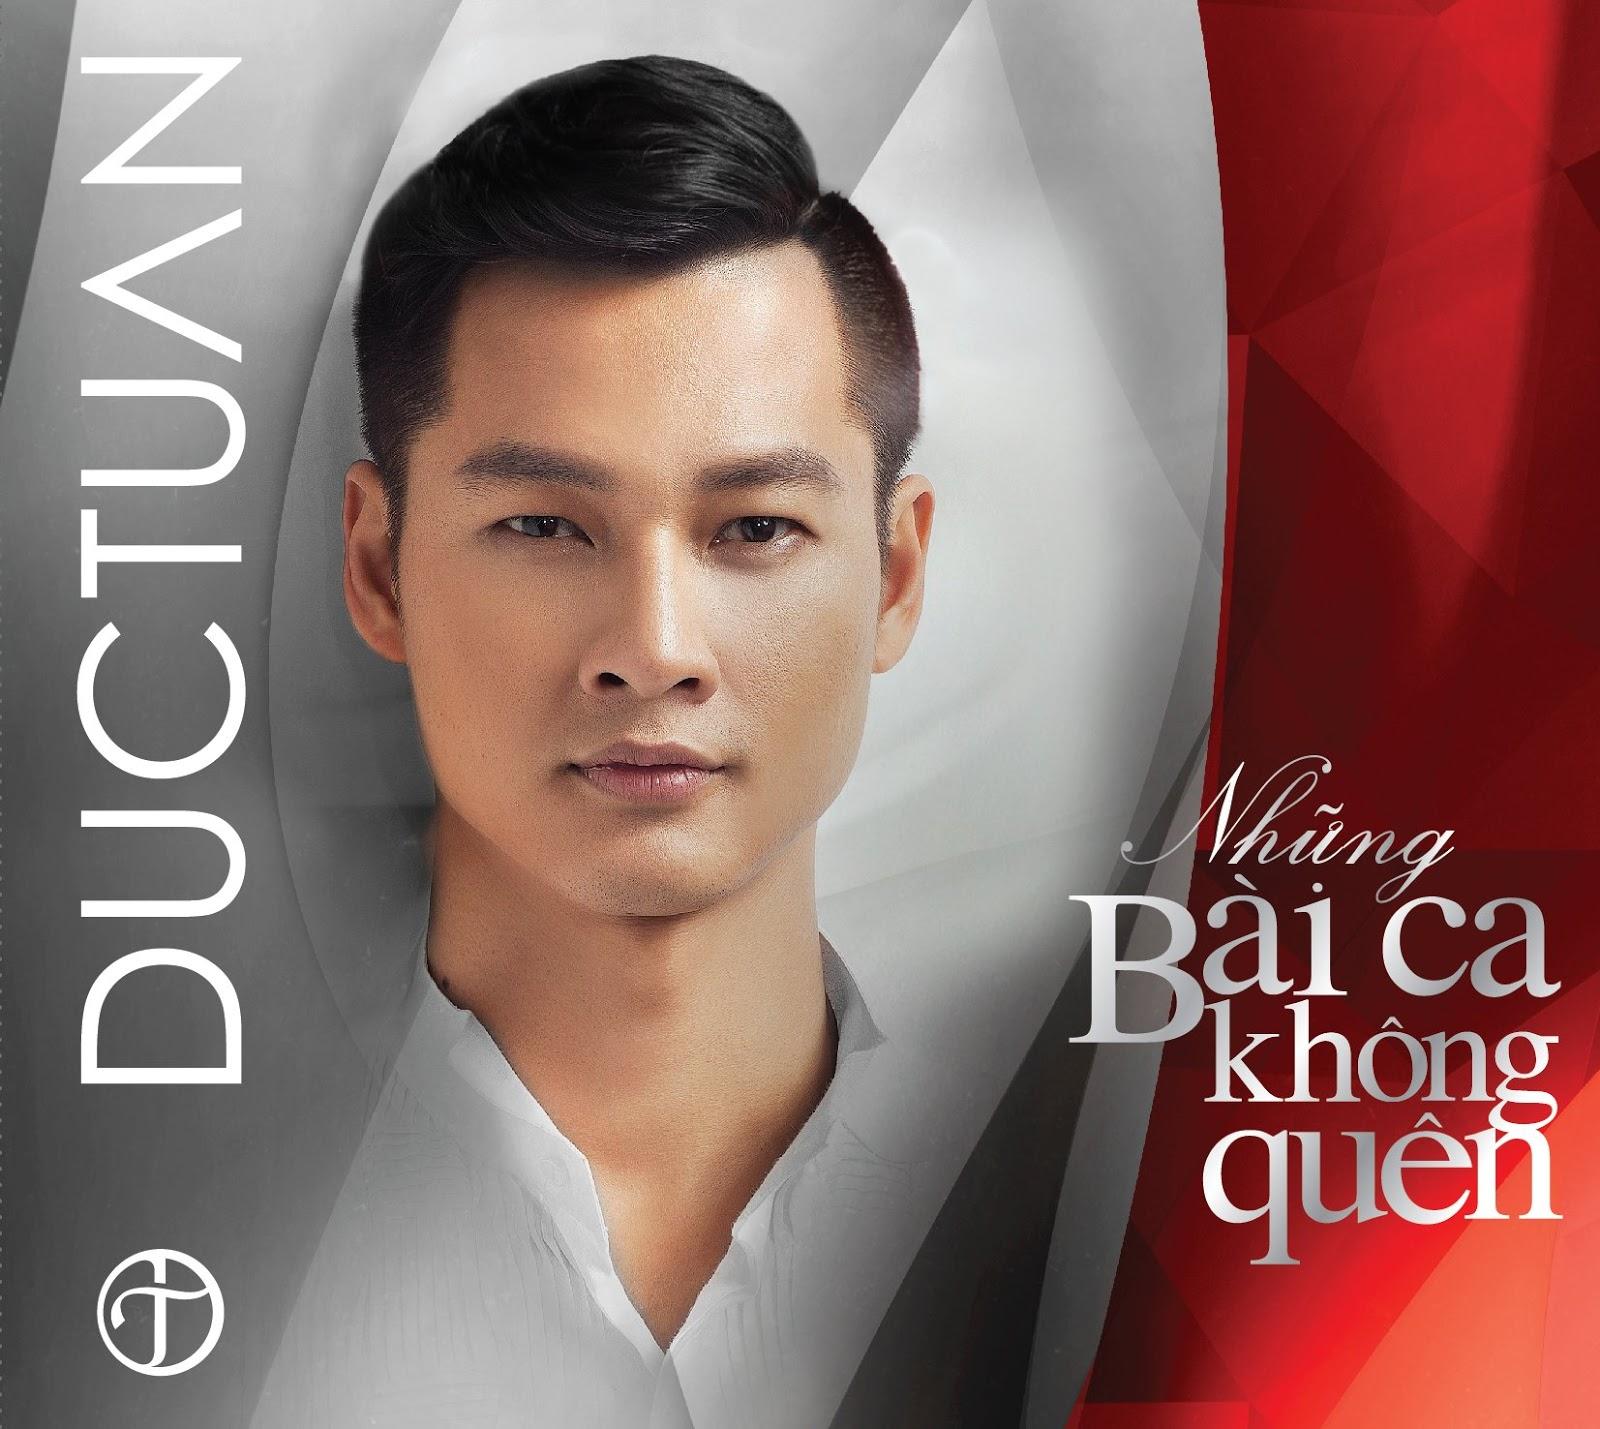 Duc Tuan Nhung Bai Ca Khong Quen